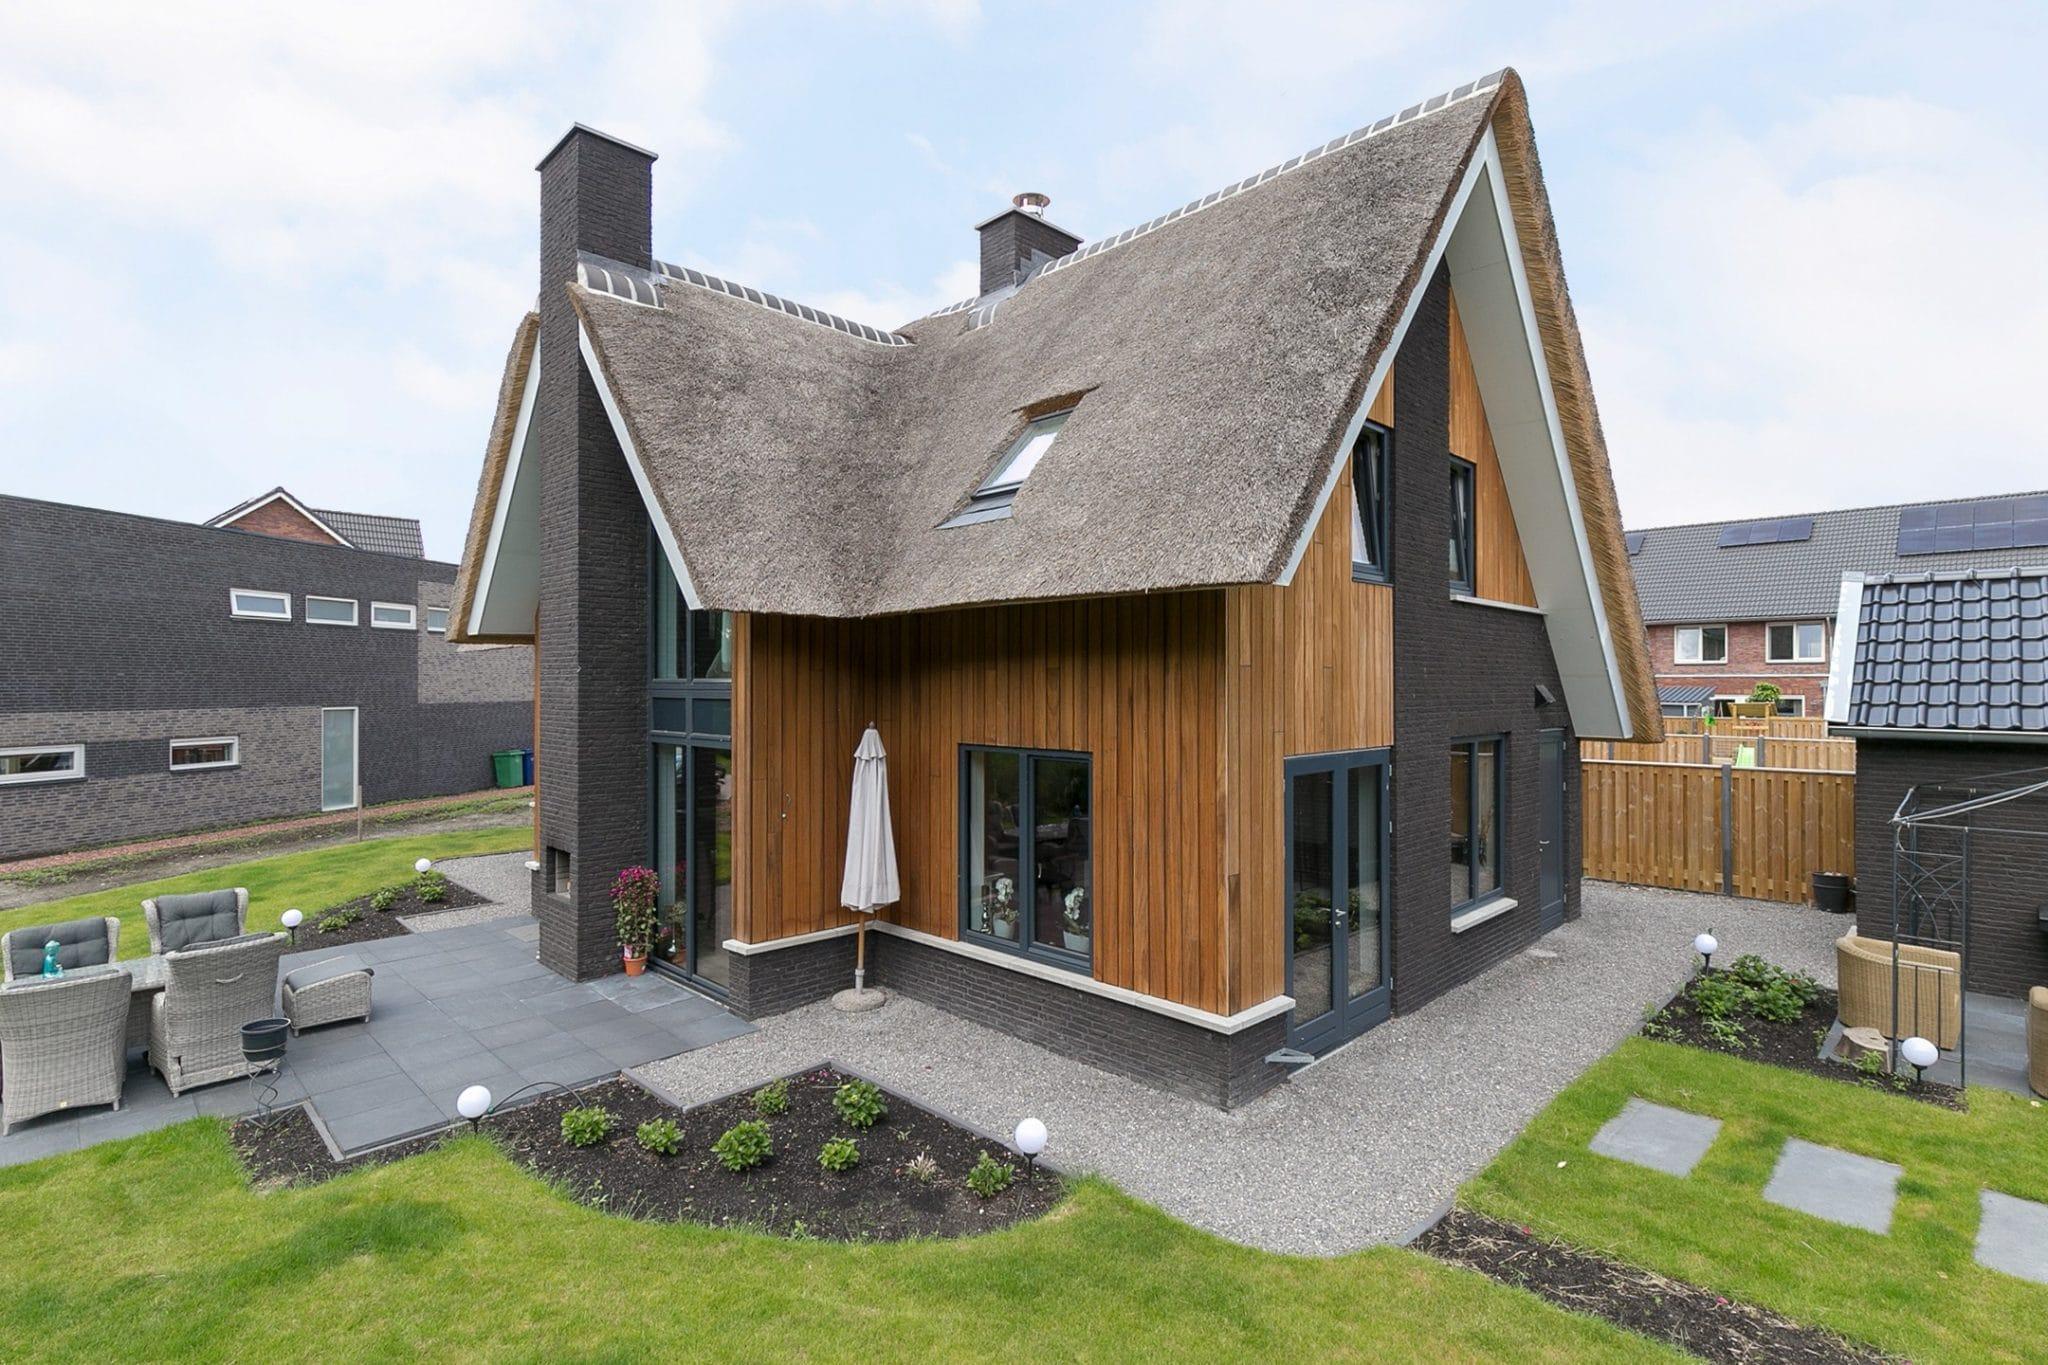 Landelijke boswachterswoning Almere